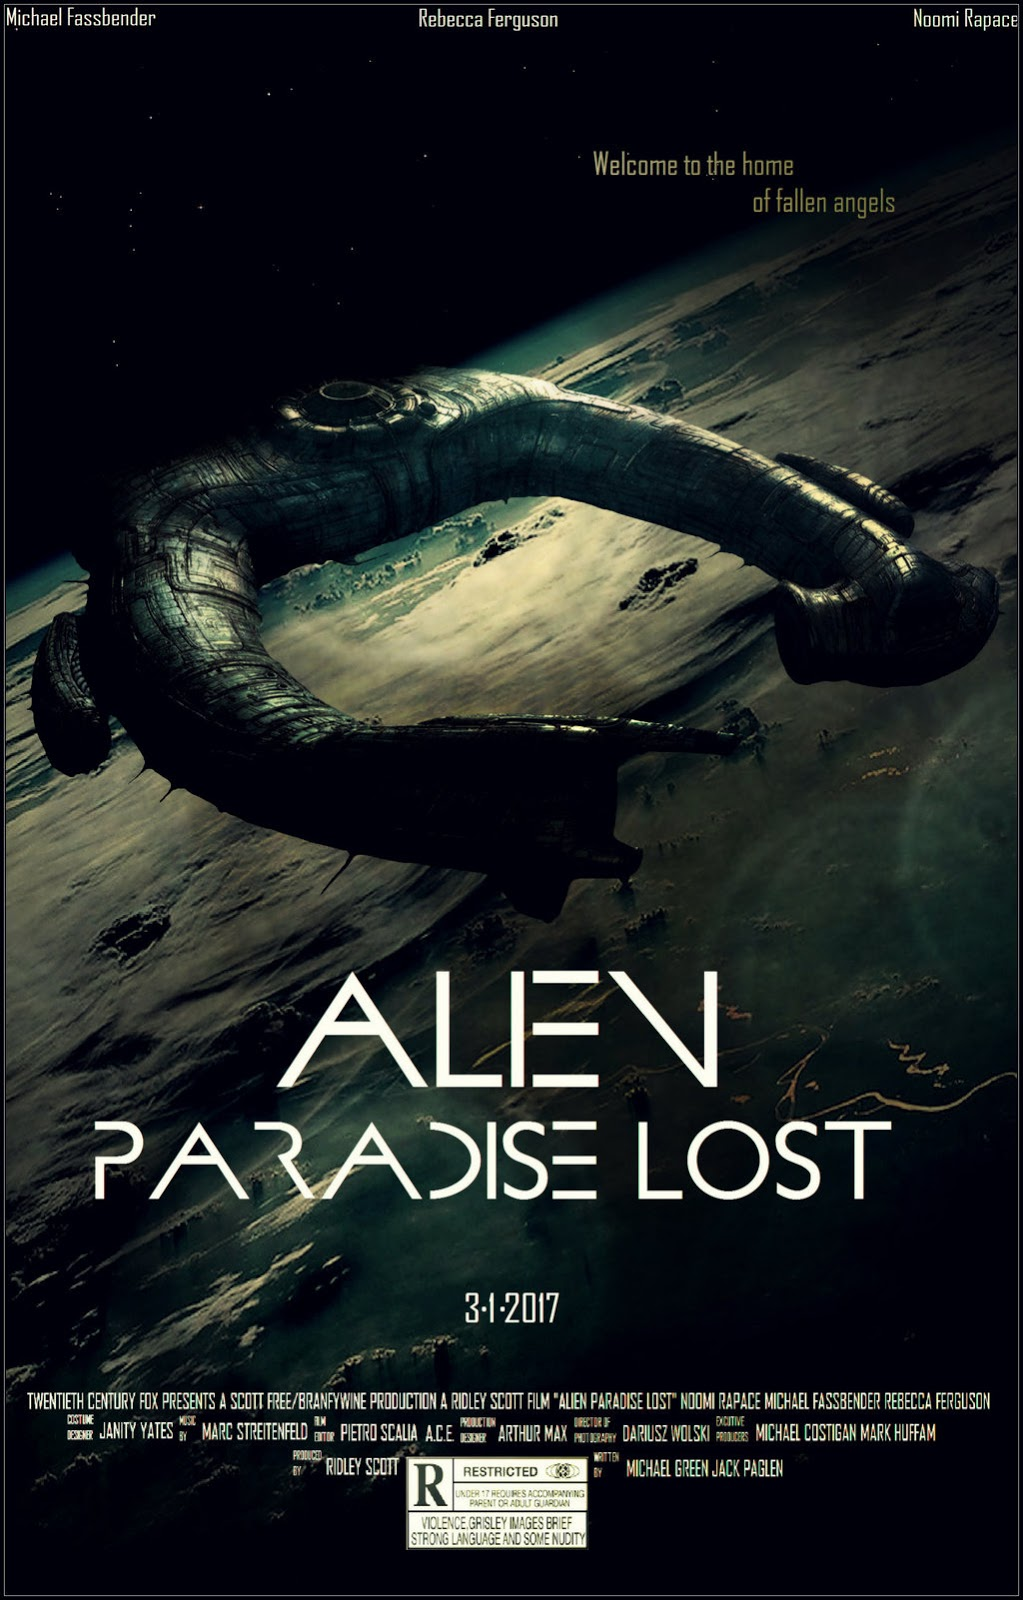 Alien Paradise Lost